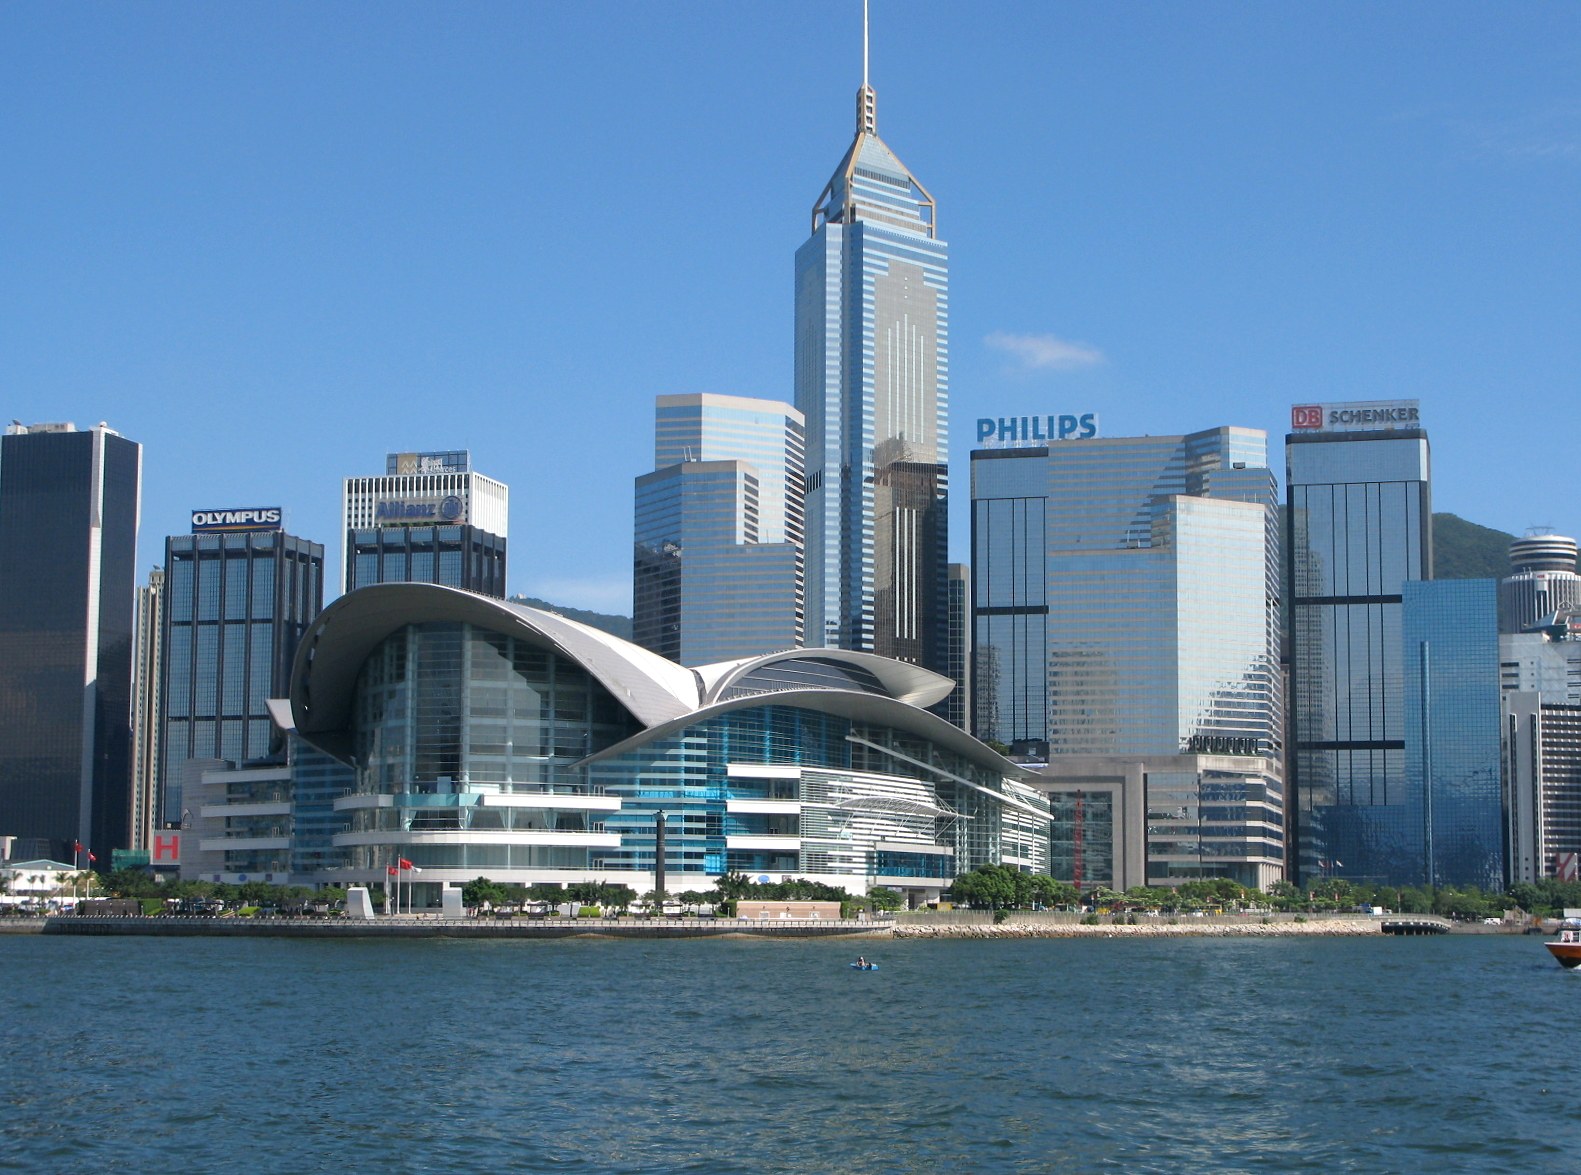 D Exhibition Hong Kong : 香港會議展覽中心 維基百科,自由的百科全書